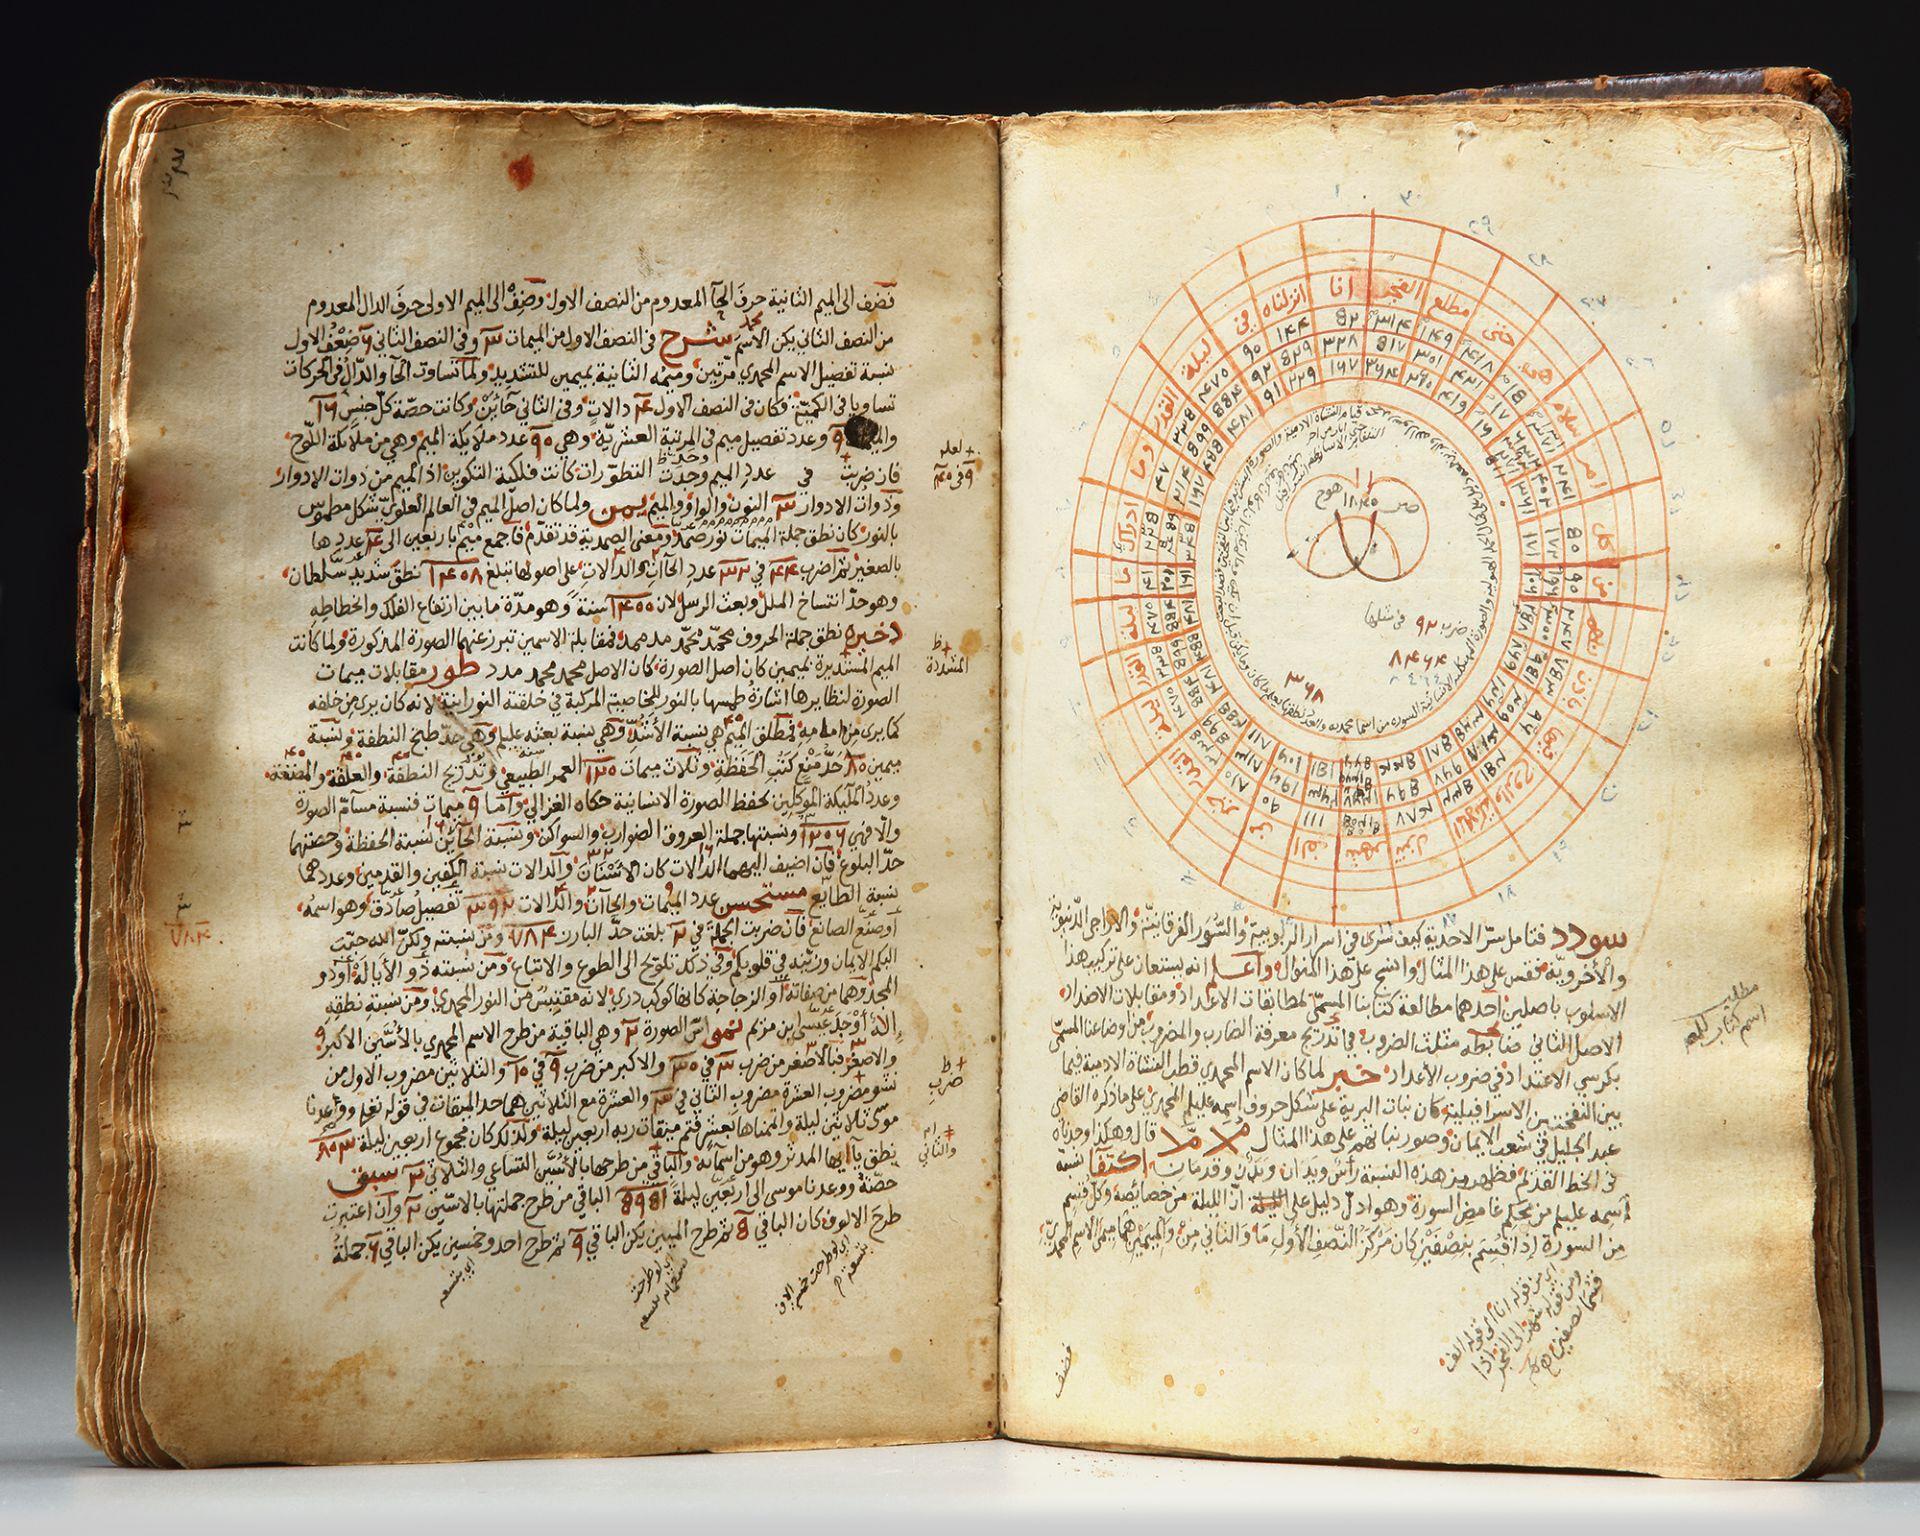 TAWIL AL'IASHARH W ATMATHIL ALEIBARIH